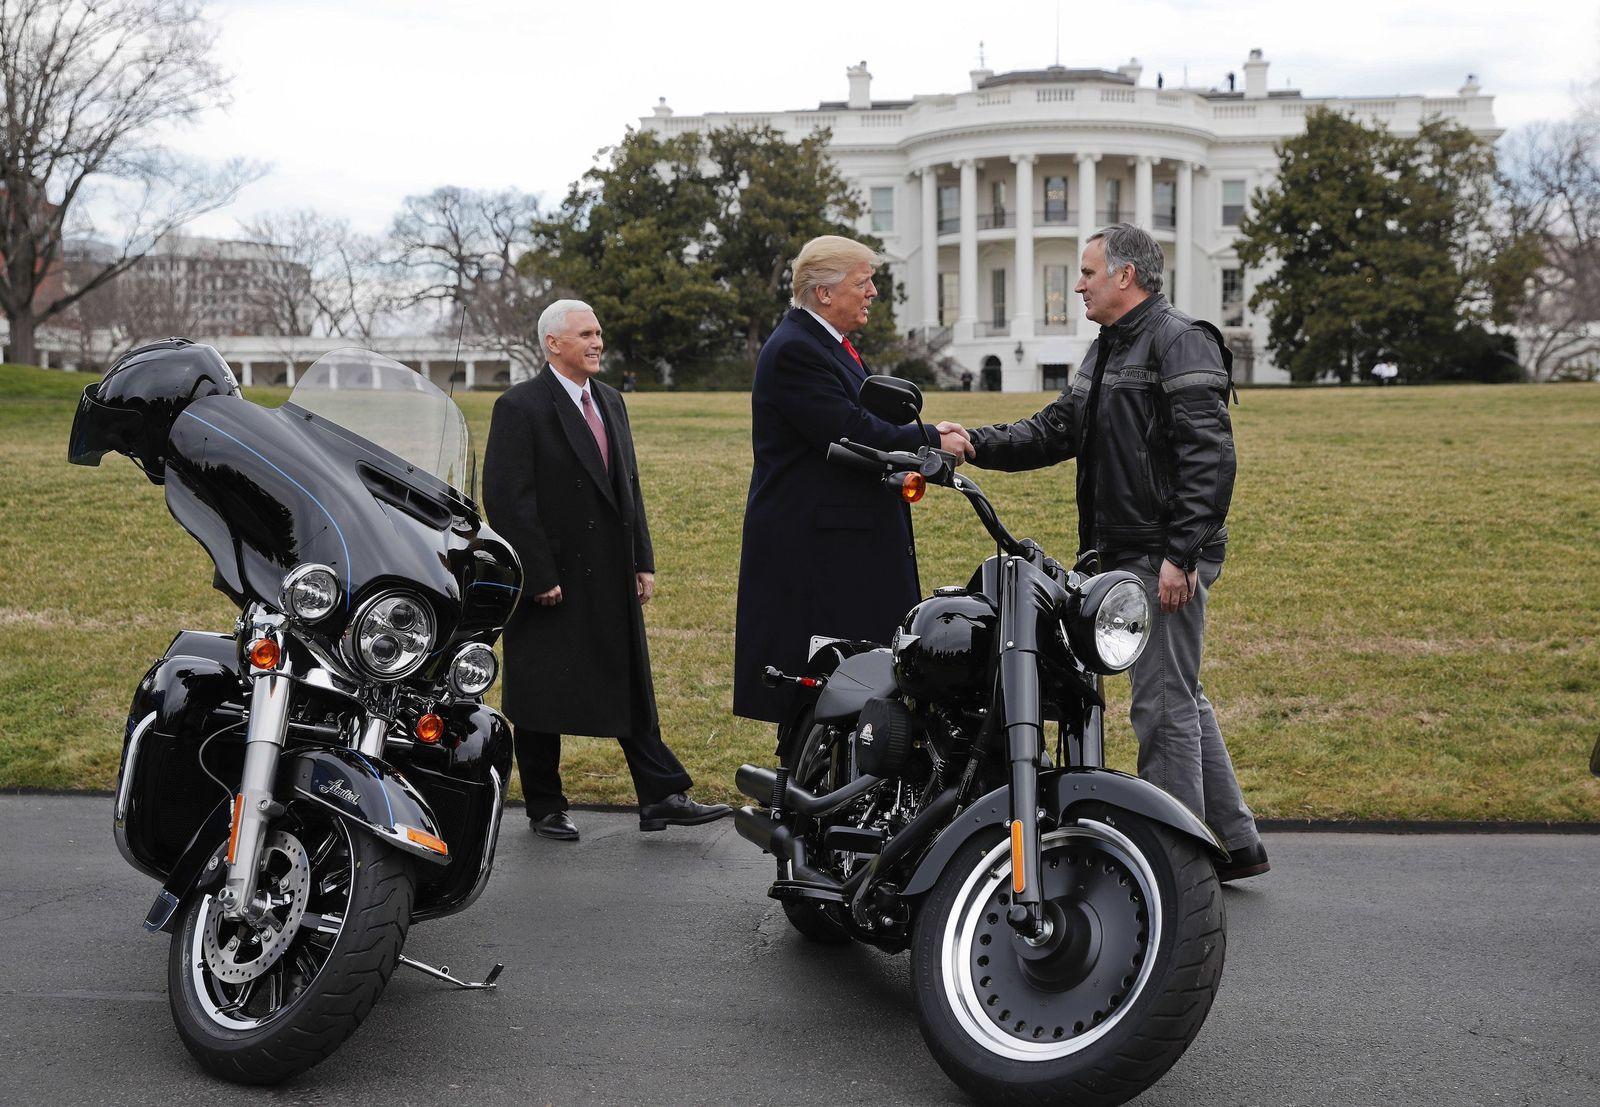 Donald Trump / Harley / 2017